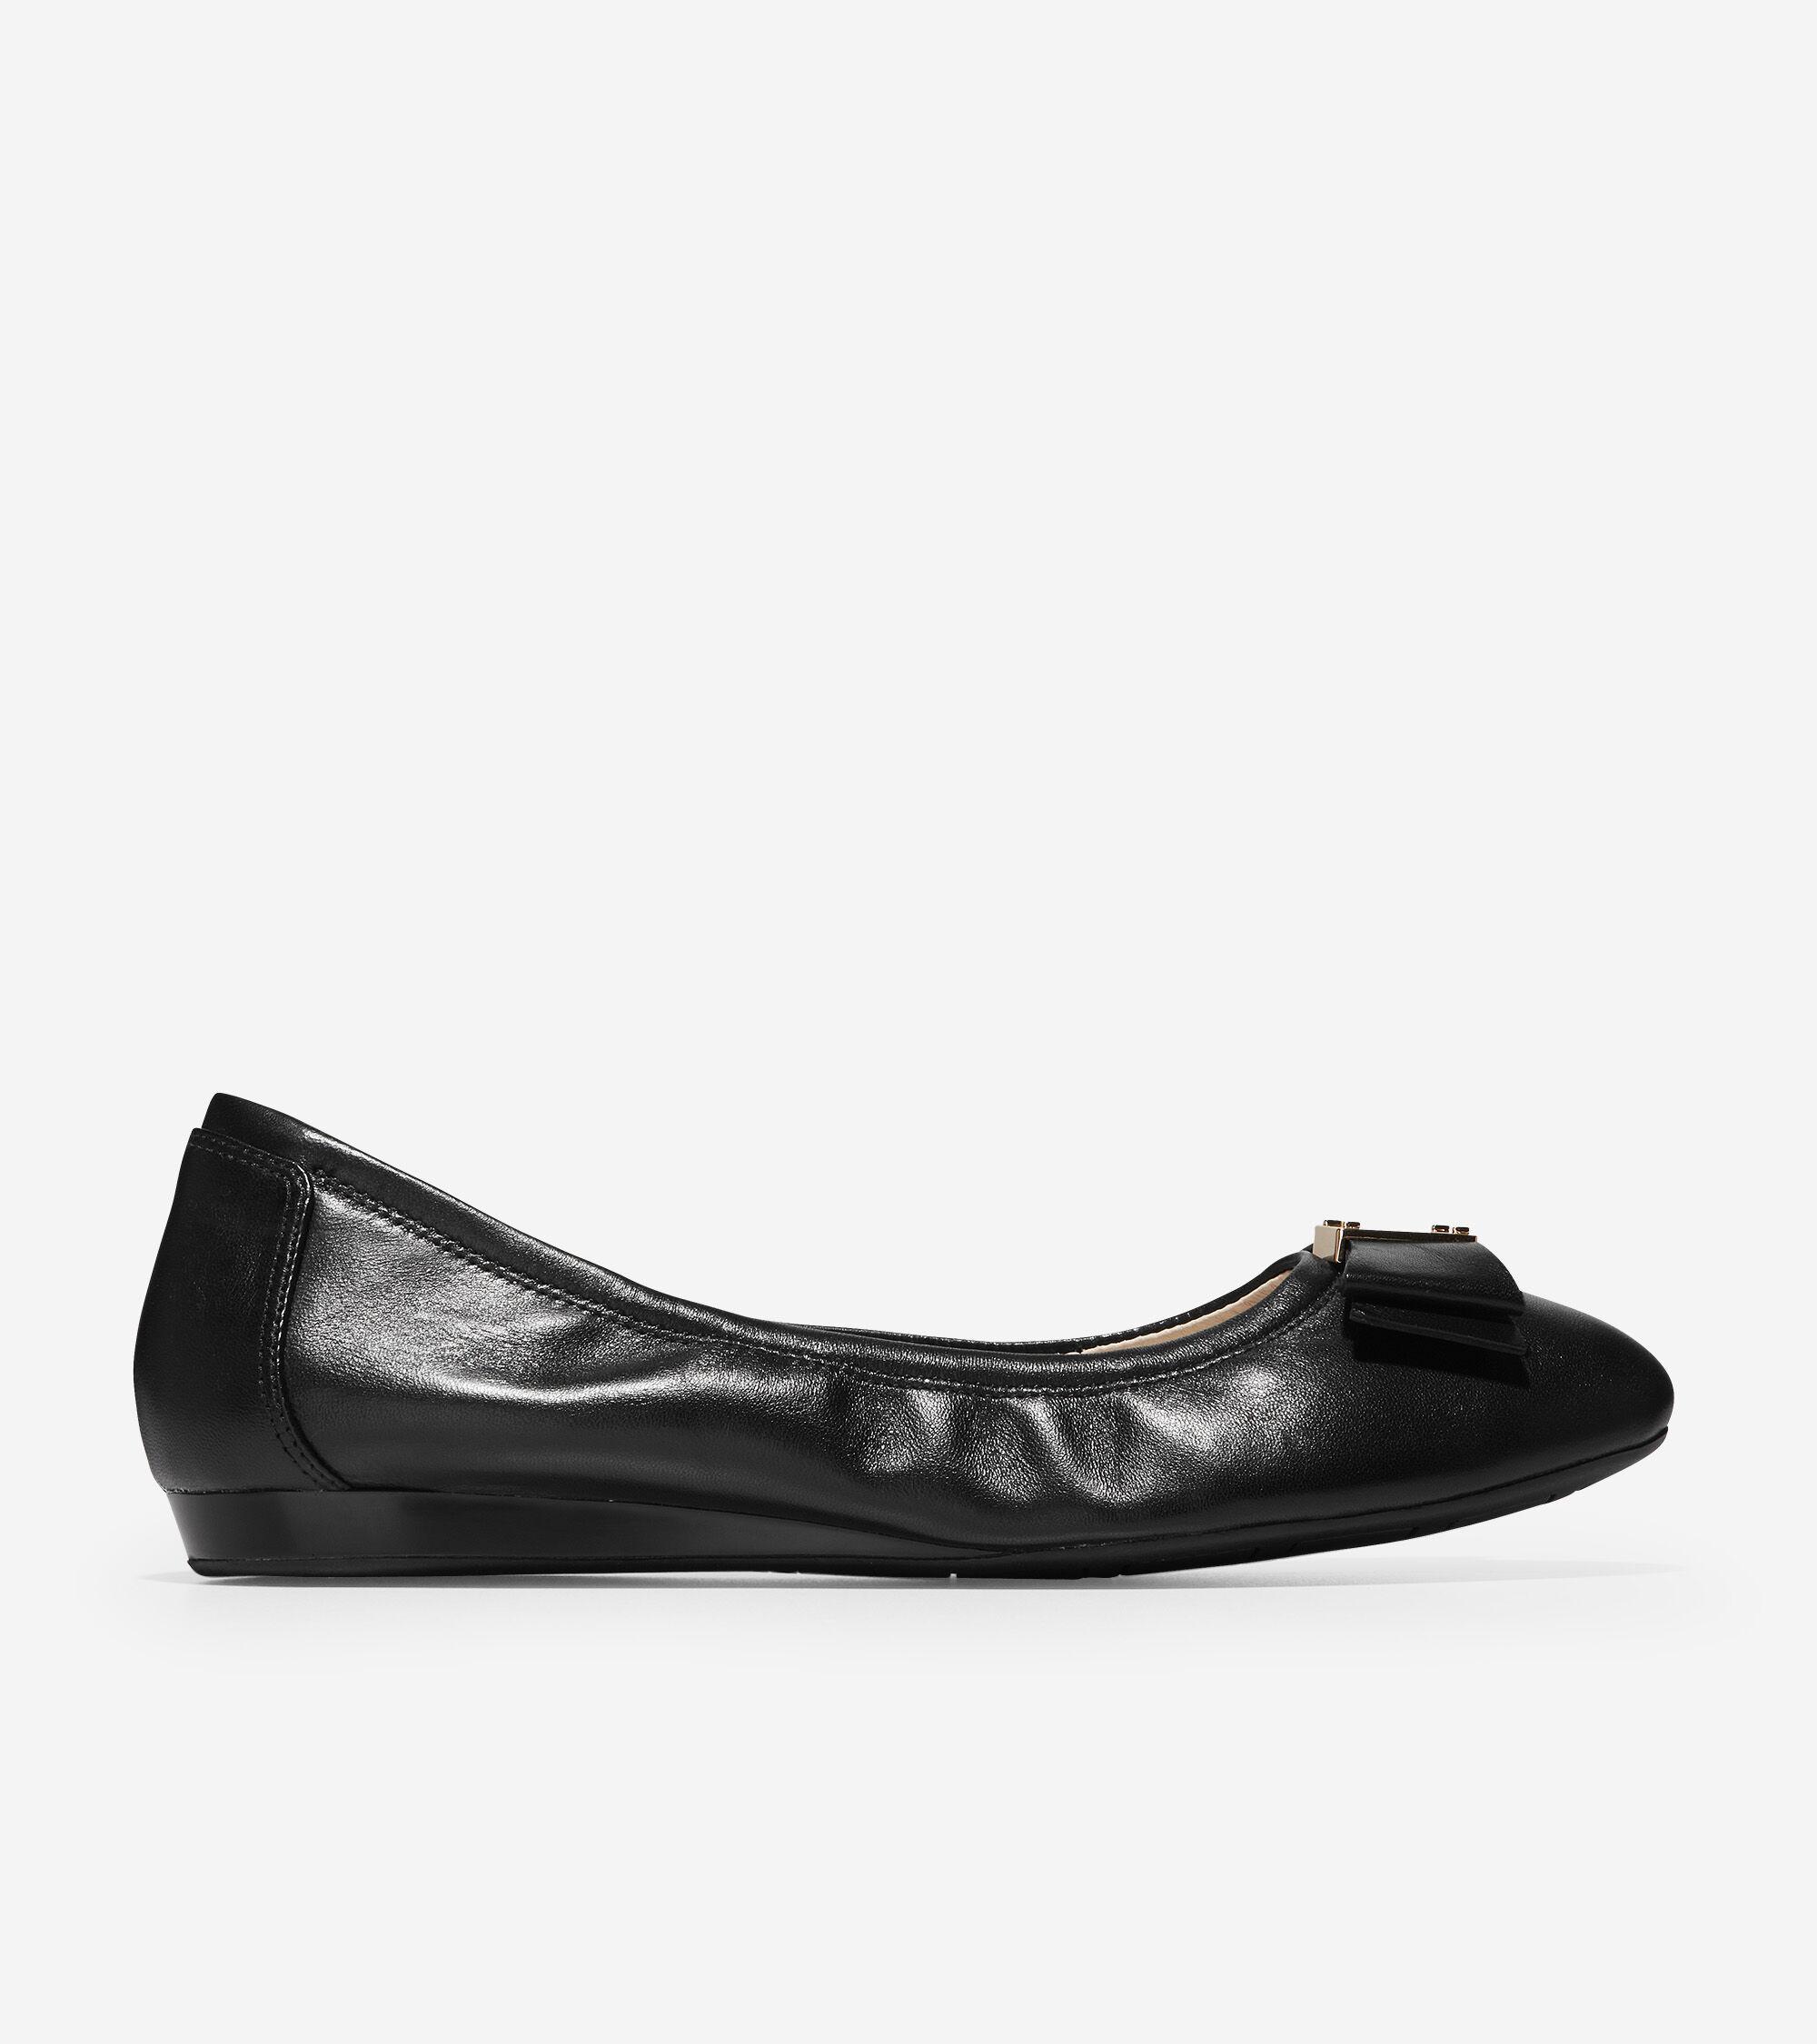 63d23105073e Women s Tali Bow Ballet Flats in Black